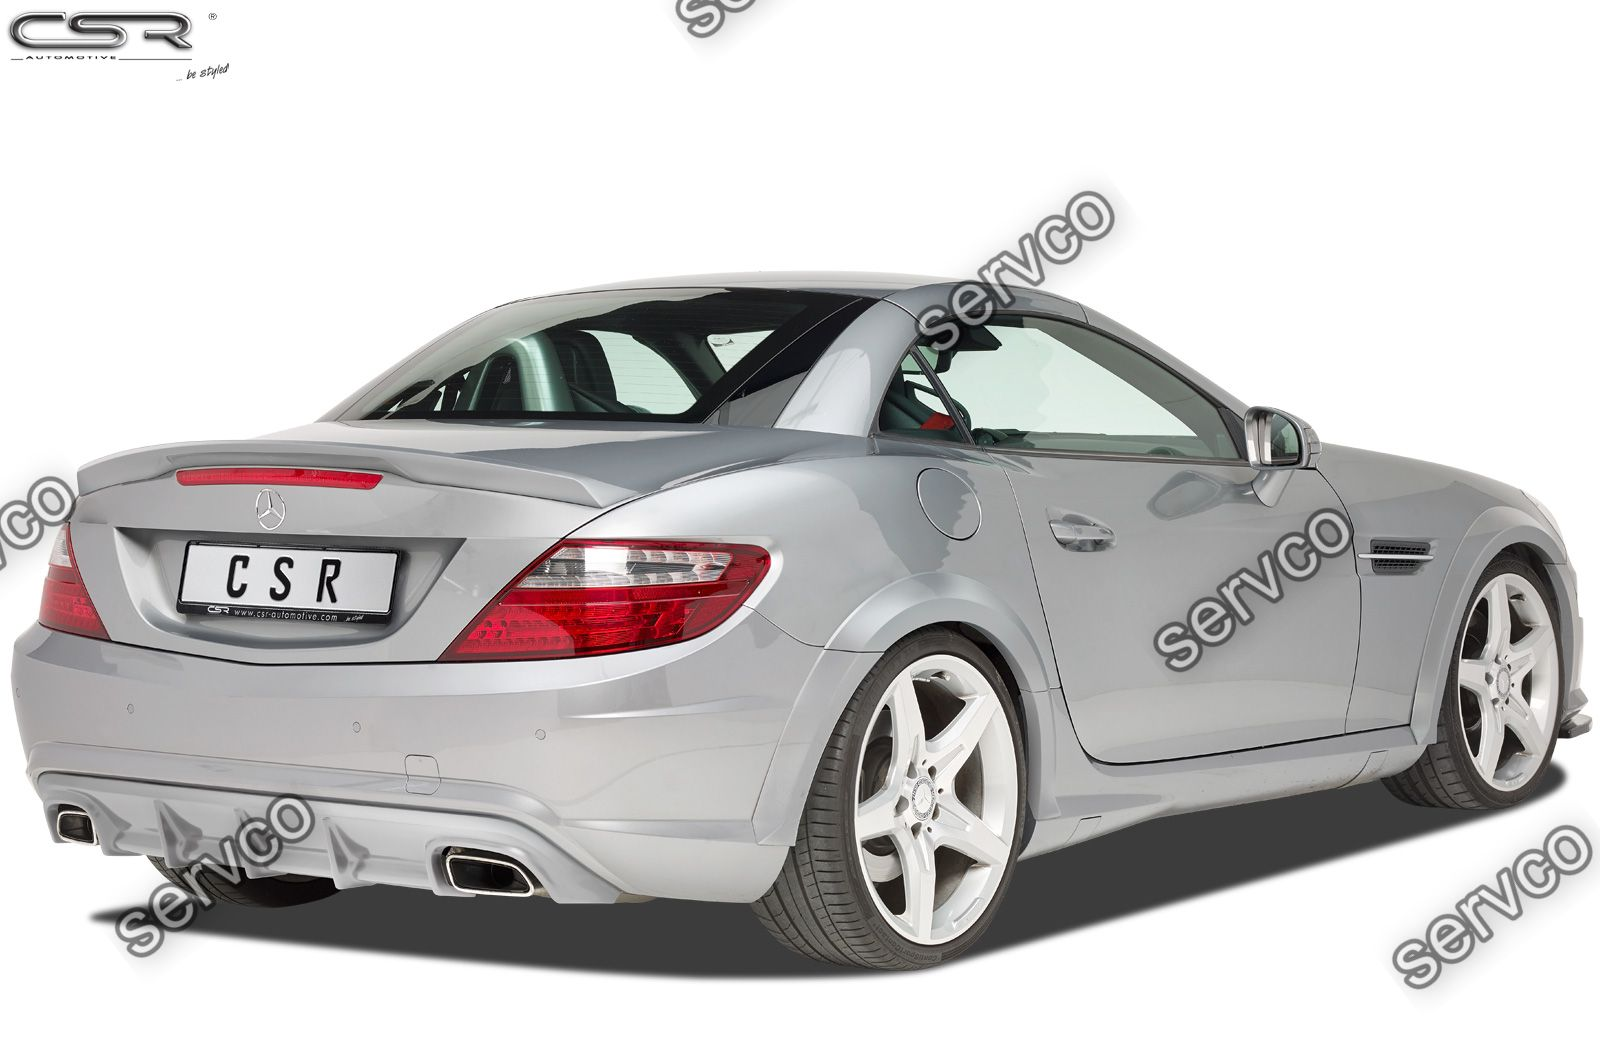 Prelungire difuzor tuning sport bara spate Mercedes SLK Class R172 AMG-Line CSR HA219 2011-2016 v1